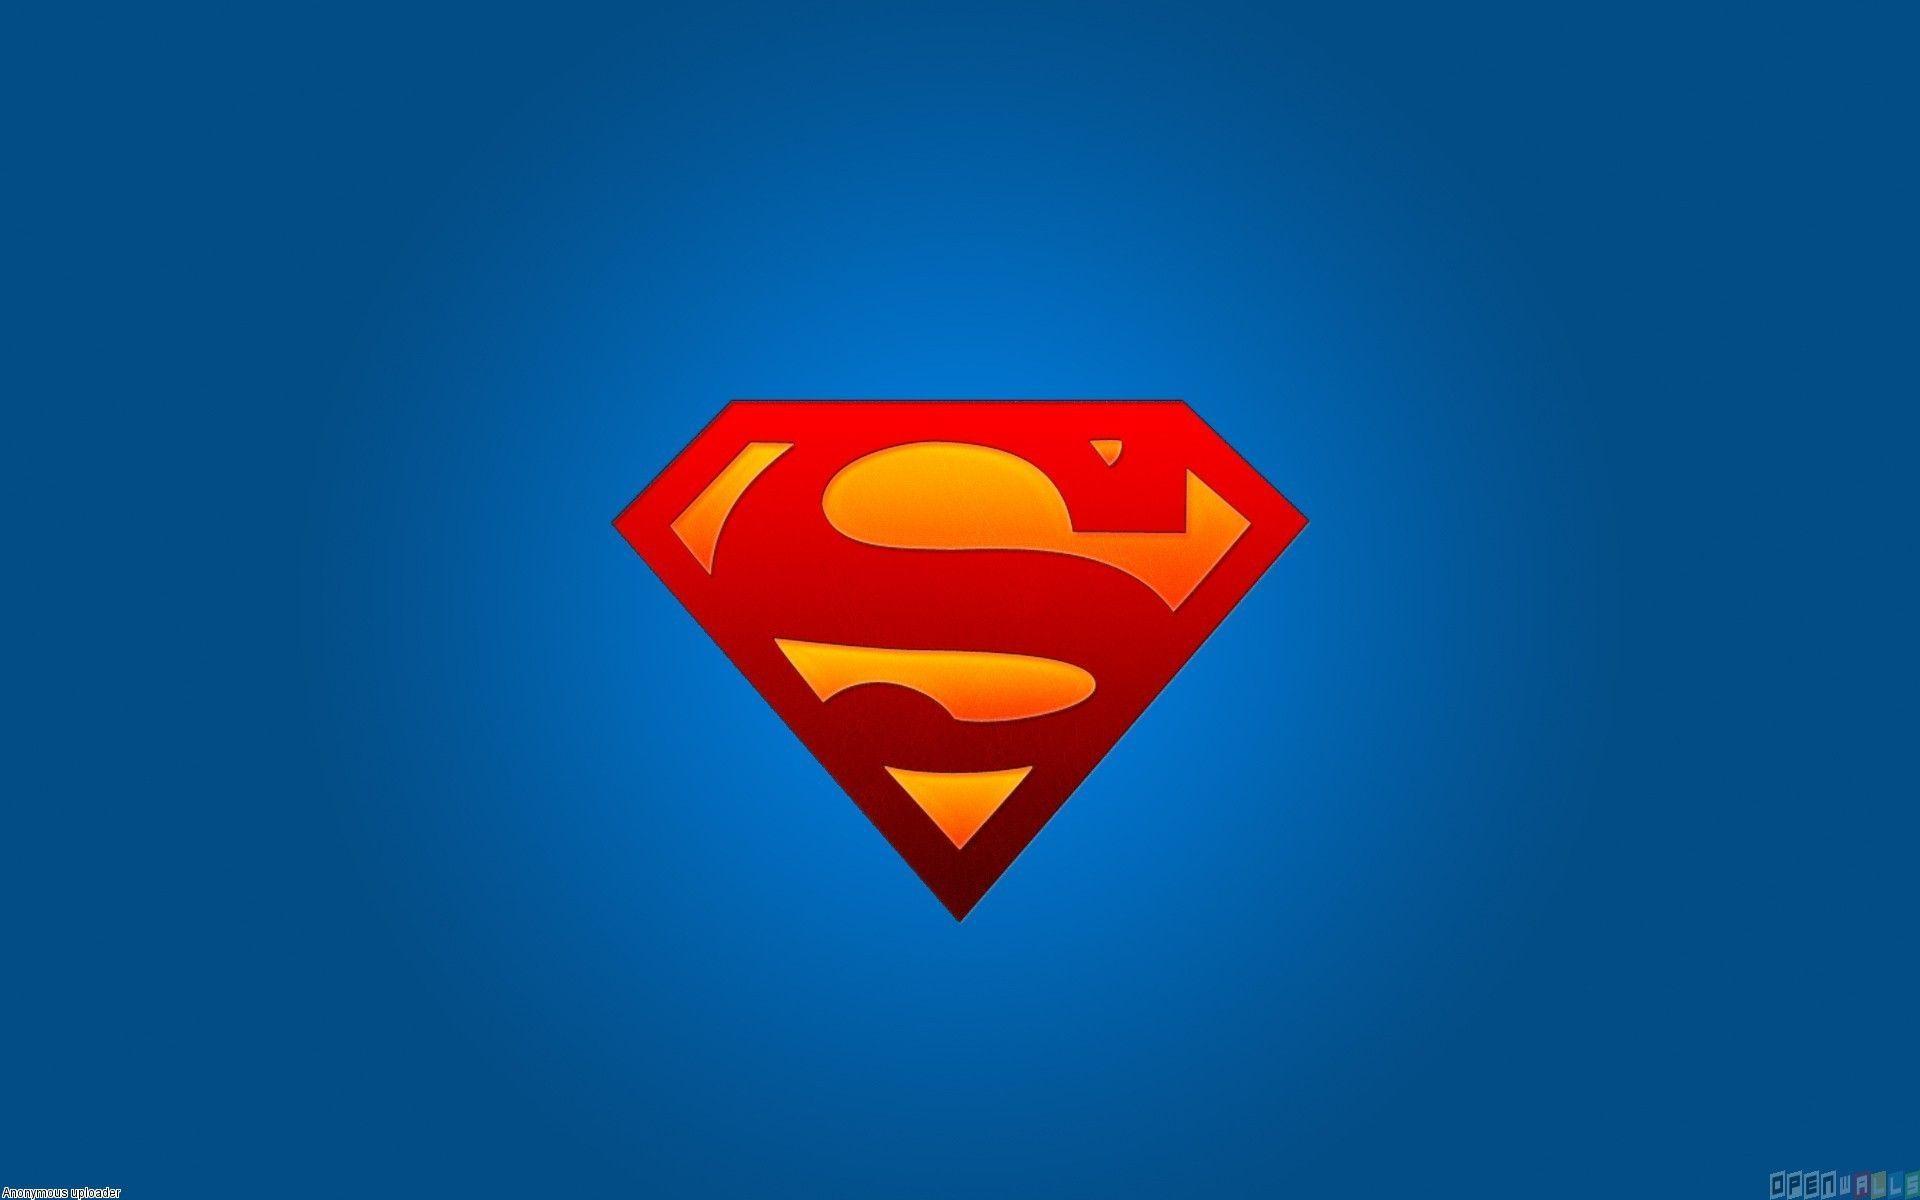 evil superman wallpaper hd - photo #30